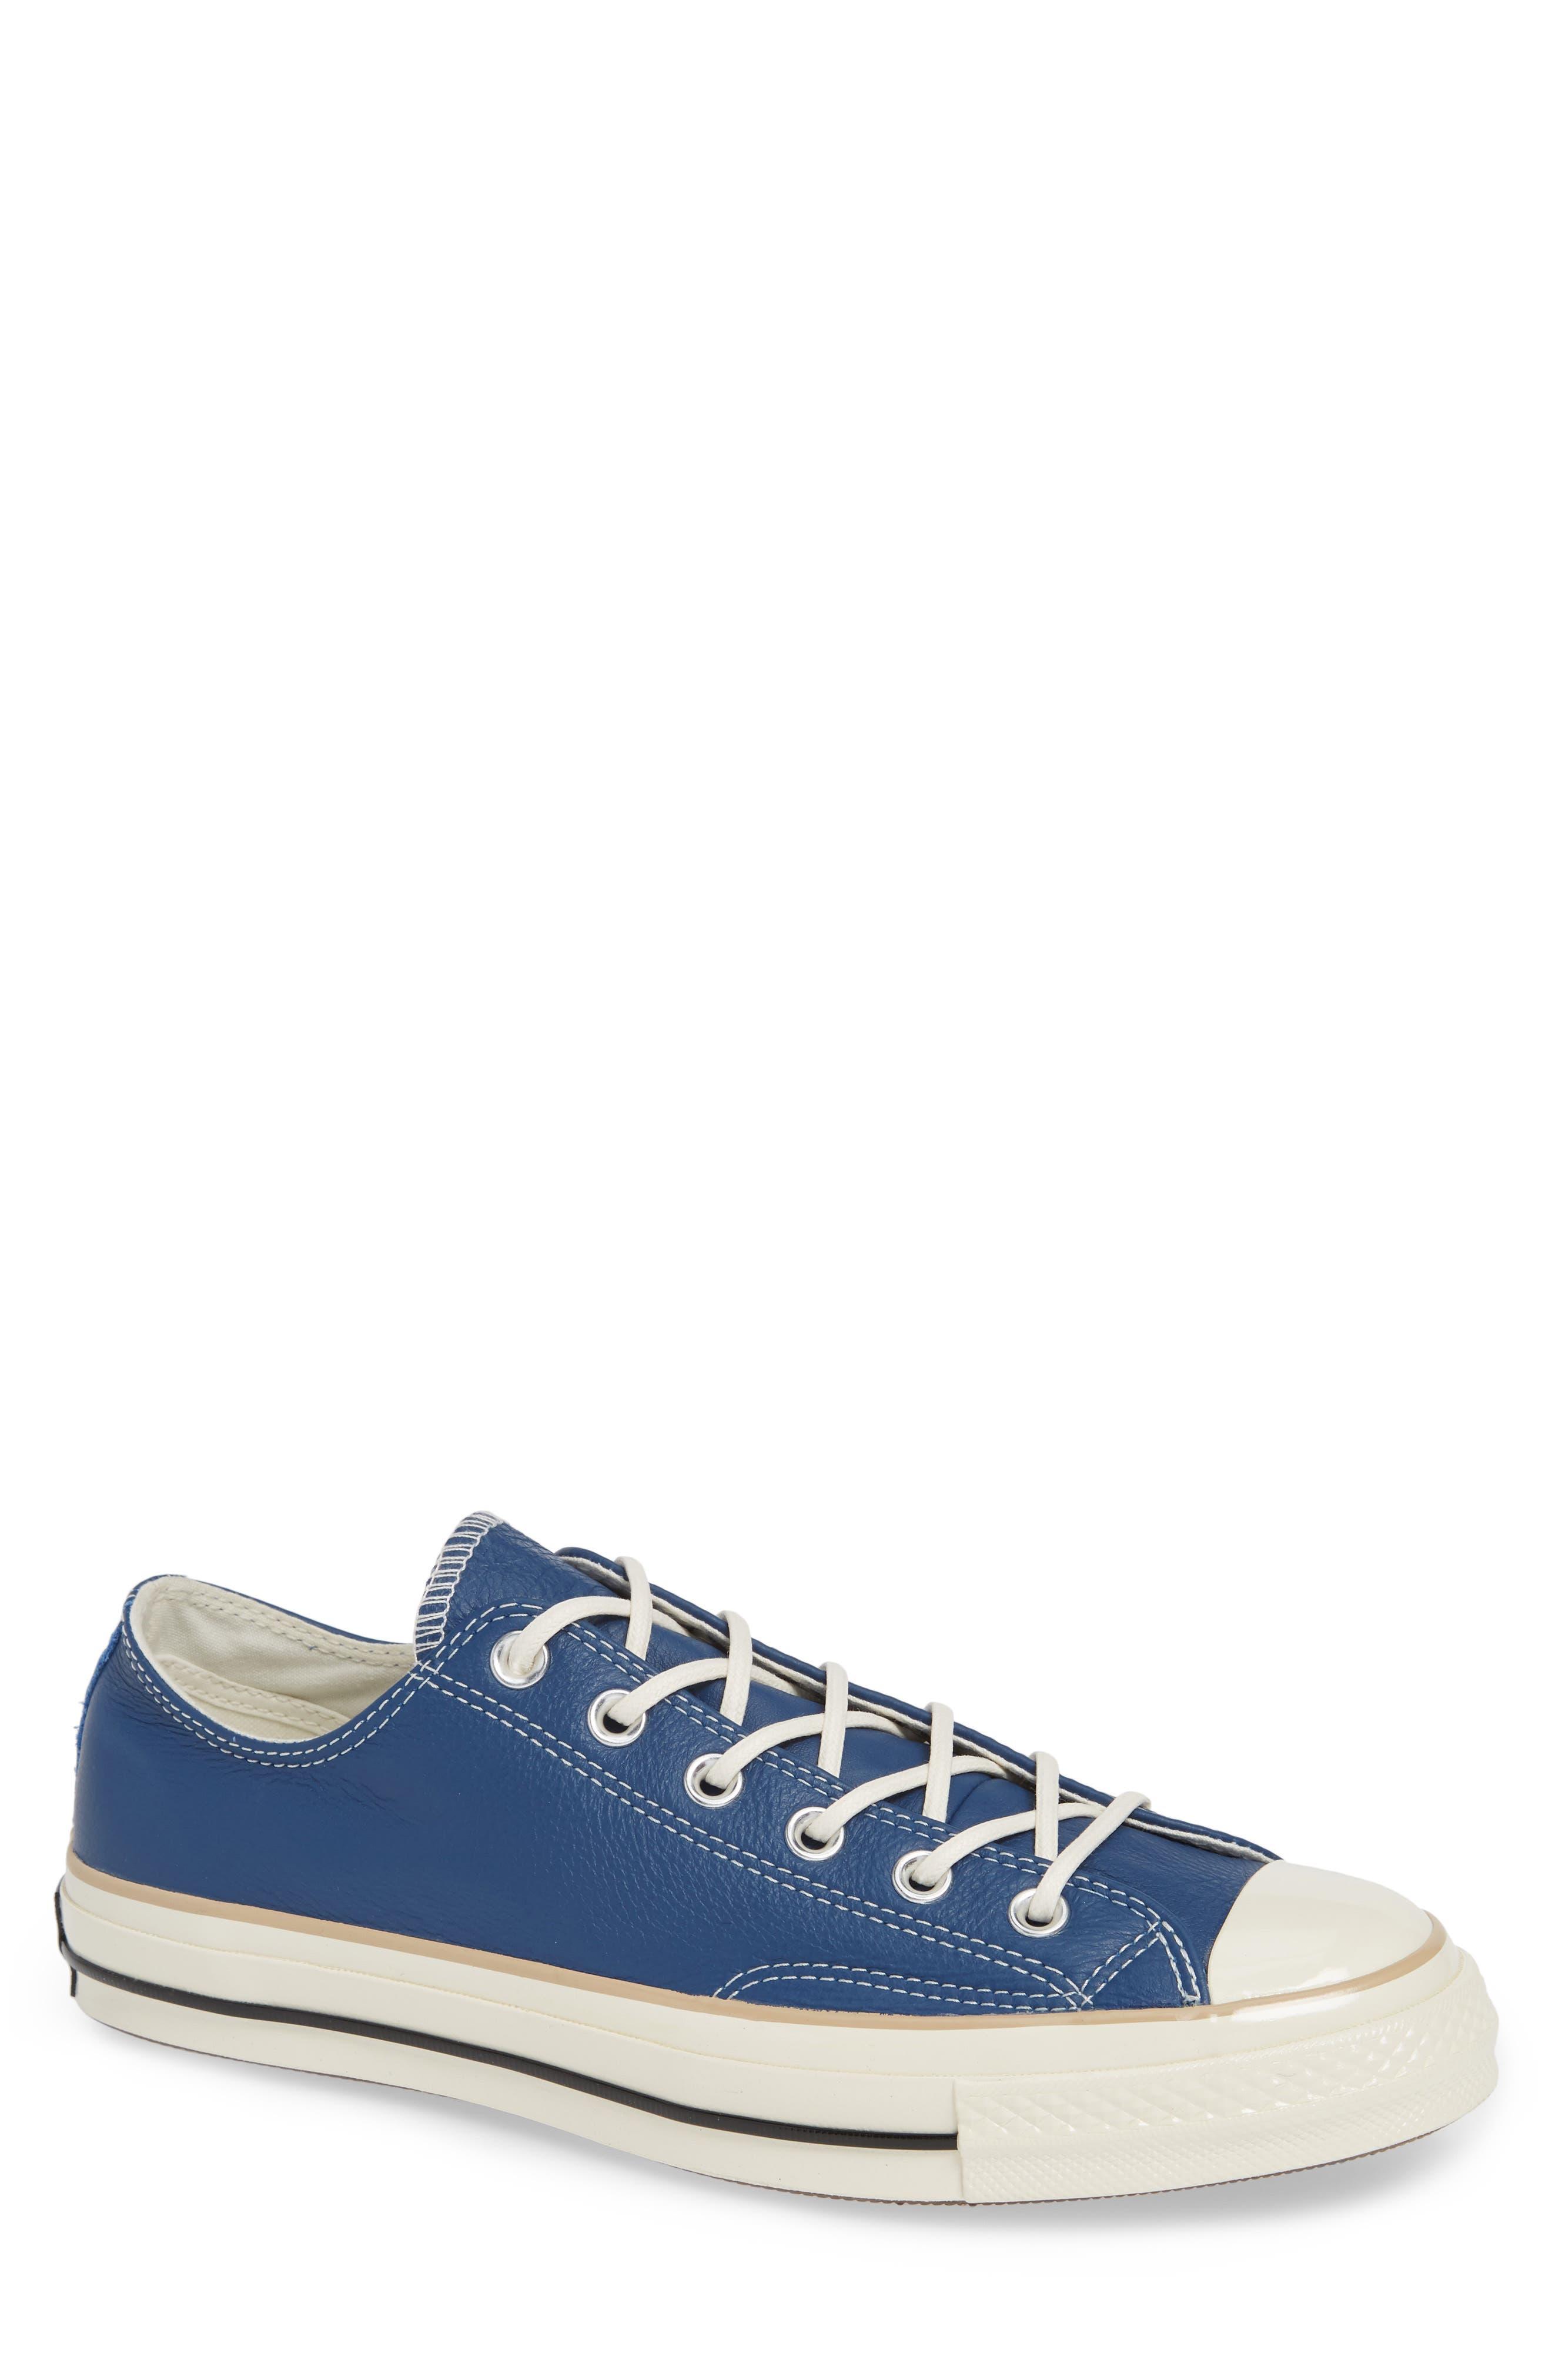 Chuck 70 Boot Leather Low Top Sneaker,                             Main thumbnail 1, color,                             DARK BURGUNDY/ CYAN/ EGRET